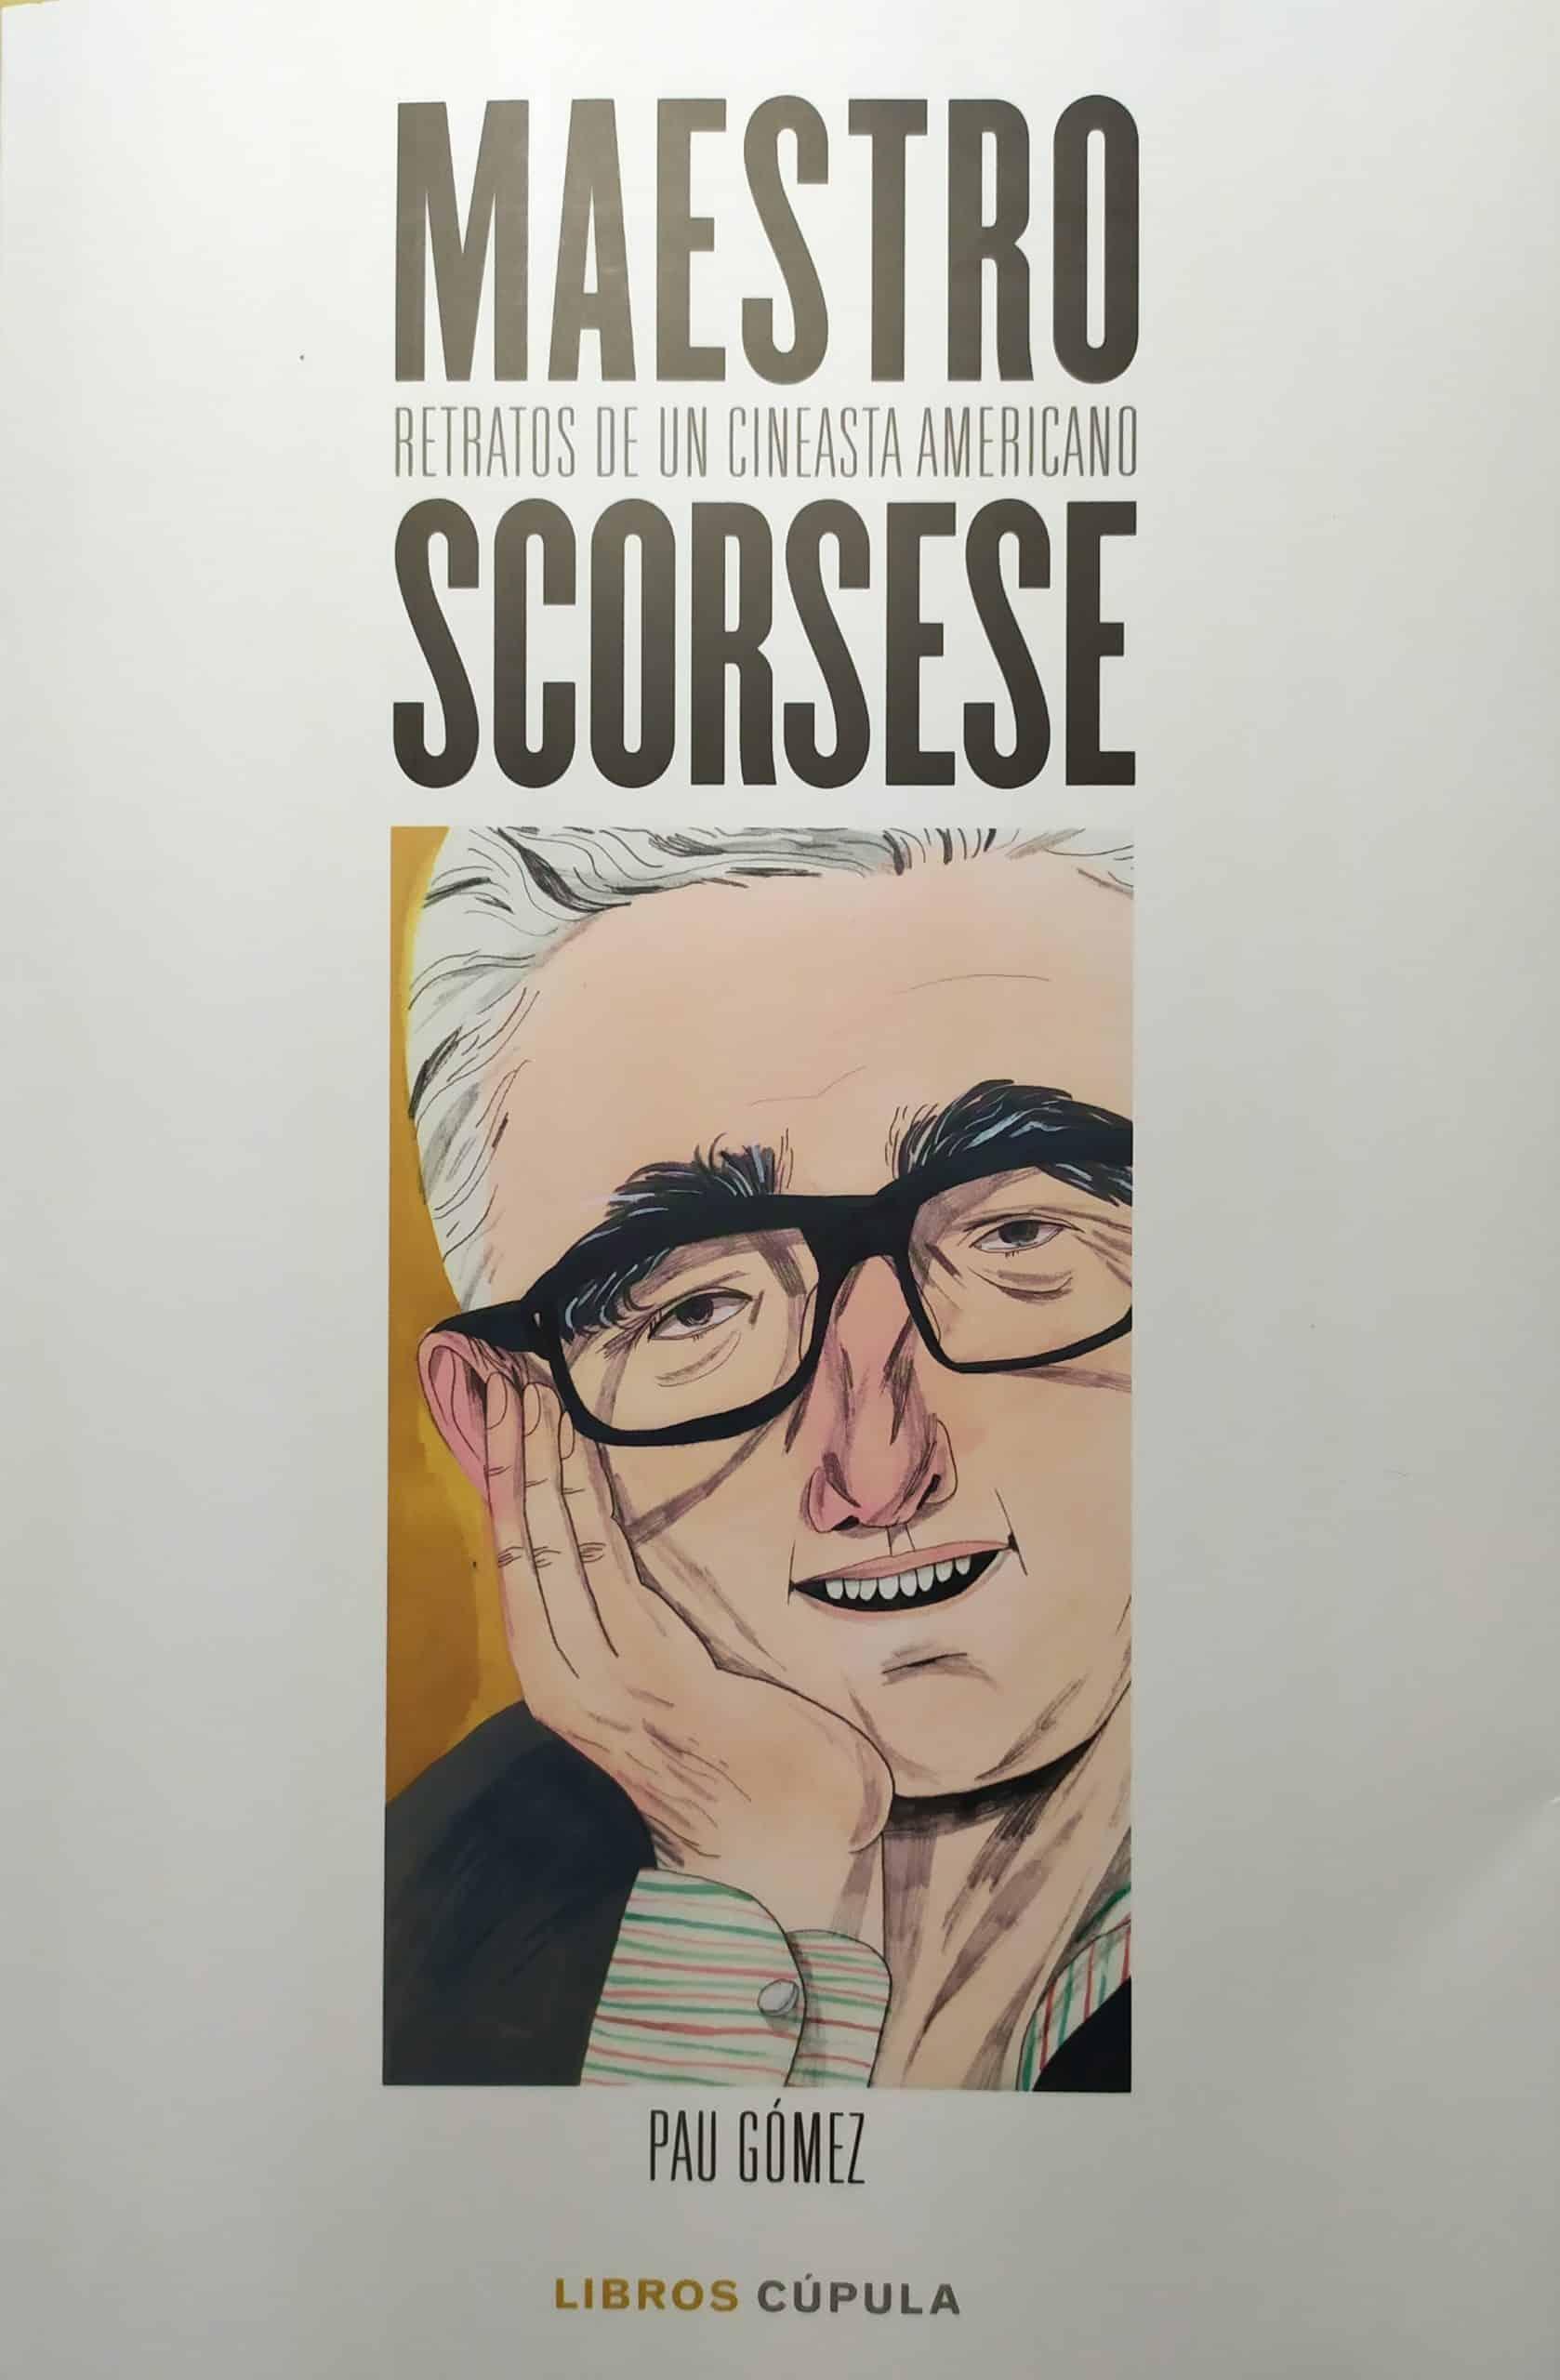 Maestro Scorsese: Retratos de un cineasta americano, de Pau Gómez